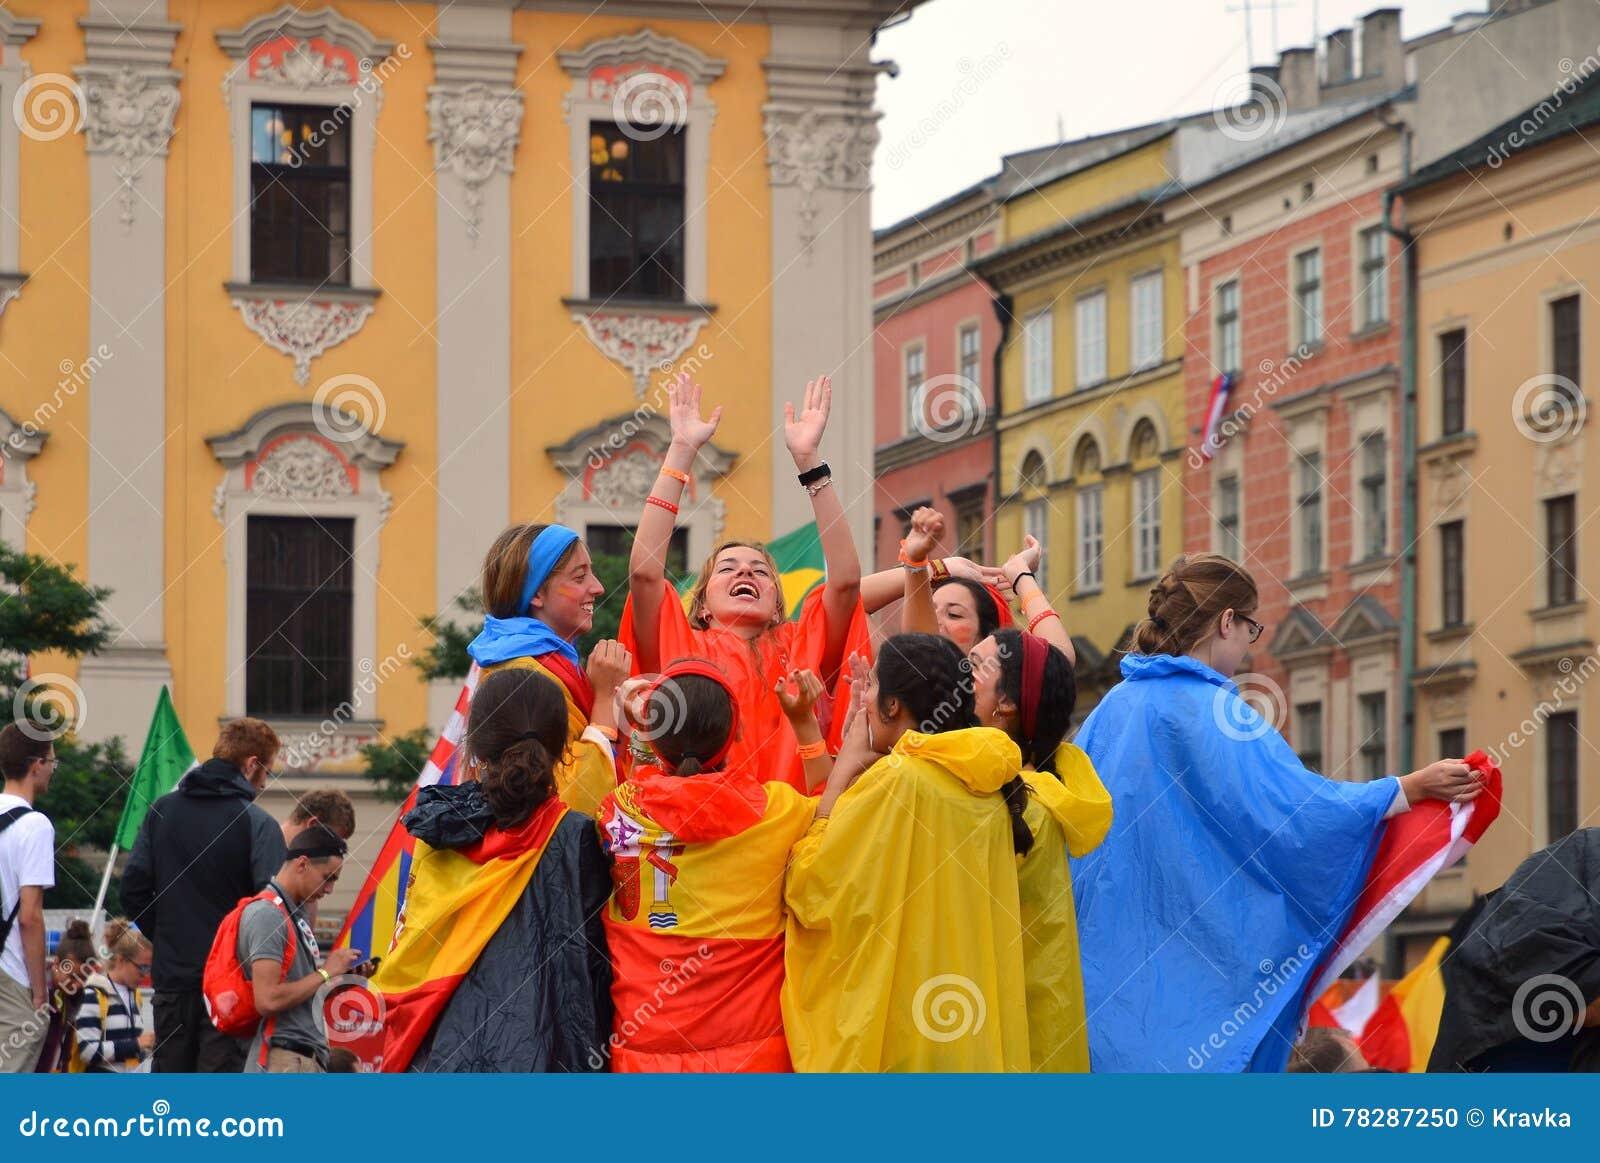 KRAKOW POLEN - JULI 27, 2016: Världsungdomdag 2016 Internationell katolsk ungdomregel Ungdomarpå huvudsaklig fyrkant i Krakow